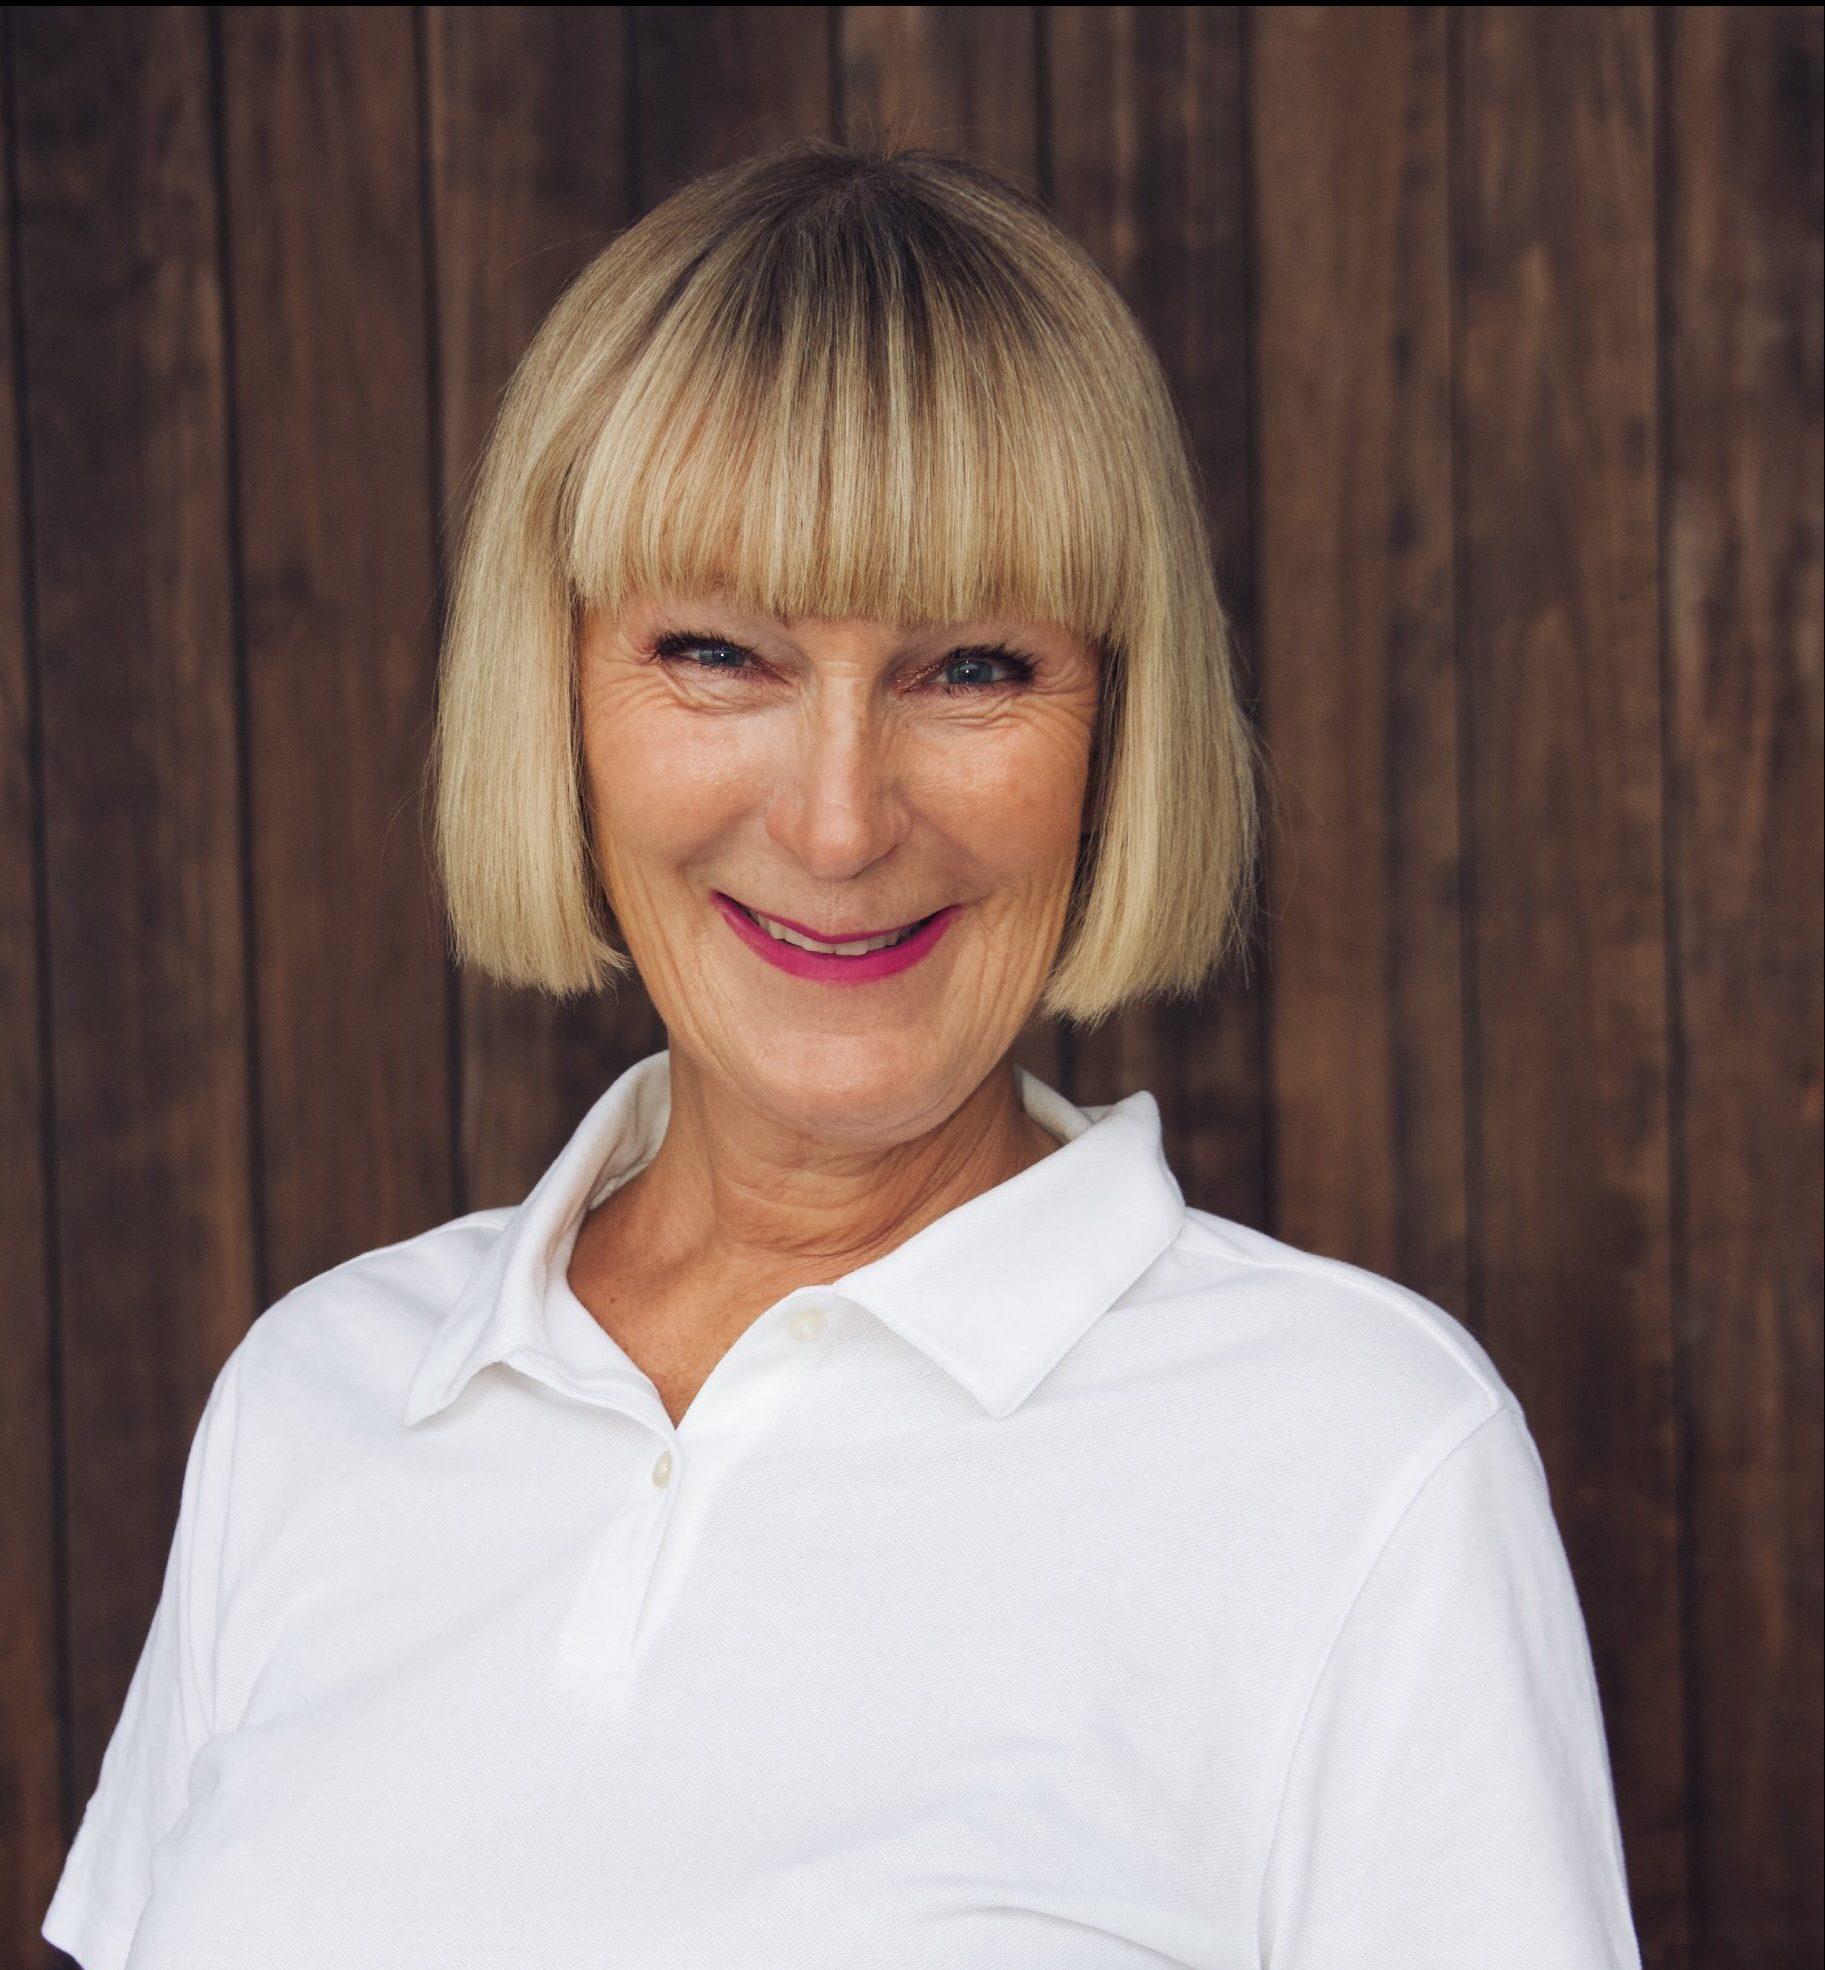 Anette Aarsland